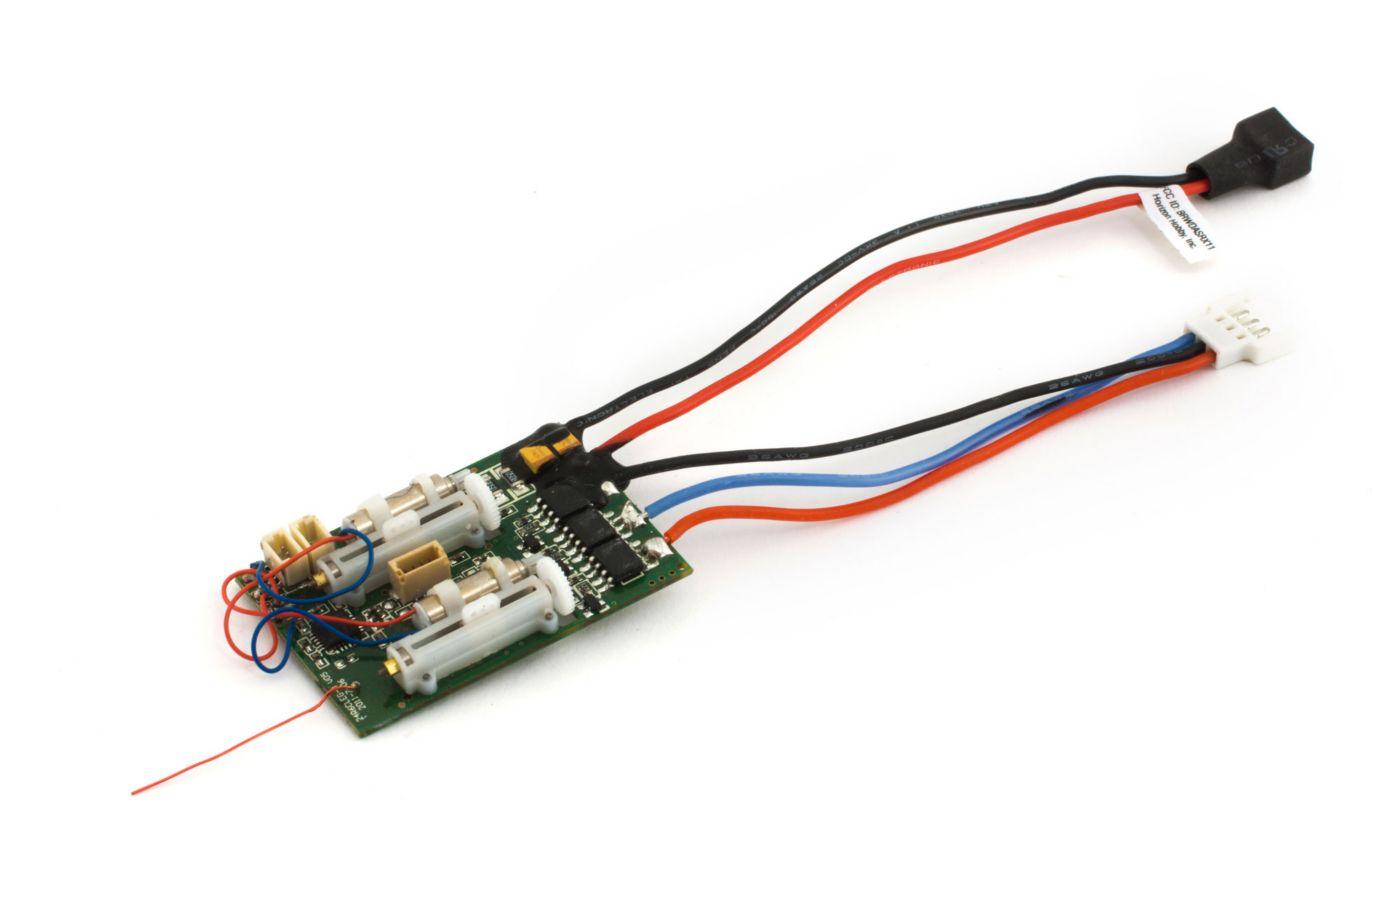 Eflite Receiver Wiring List Of Schematic Circuit Diagram Simplex Fire Alarm Sounder With Flasher Dsm2 6 Ch Ultra Micro As3x Bl Esc Horizonhobby Rh Com